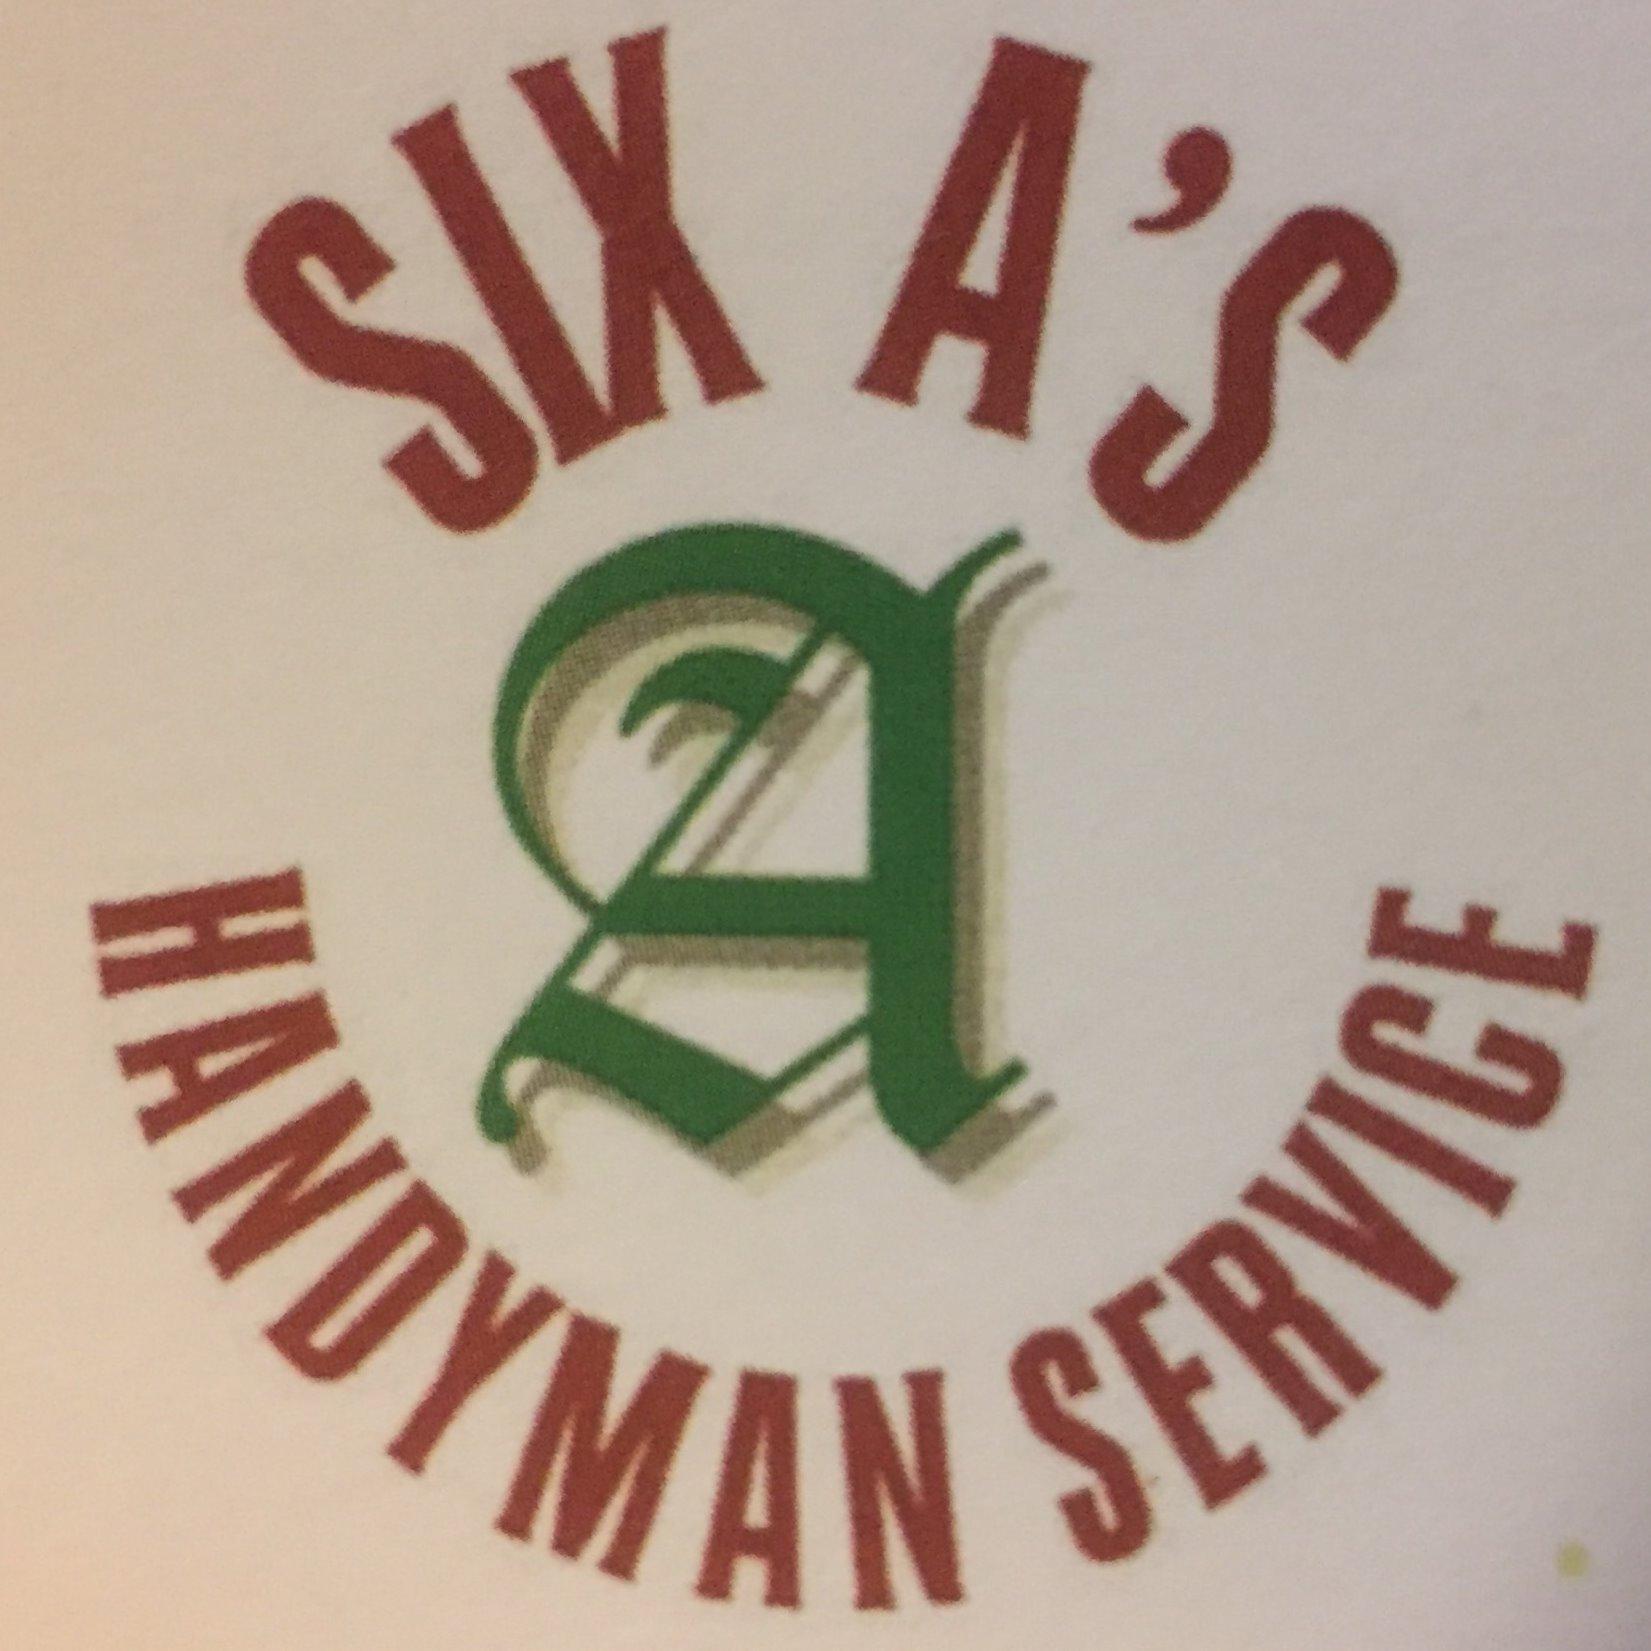 Six A's Handyman Service - Cary, NC 27513 - (919)271-8229 | ShowMeLocal.com